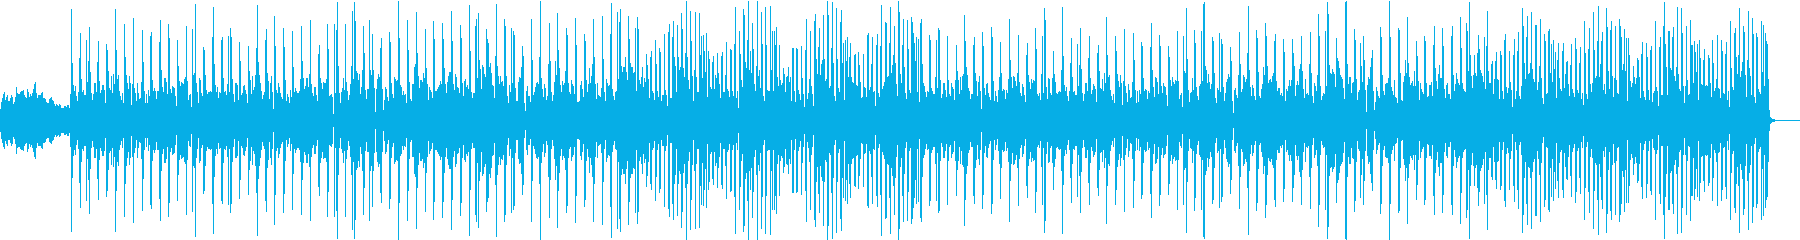 YouTubeオープニングファンクポップの再生済みの波形